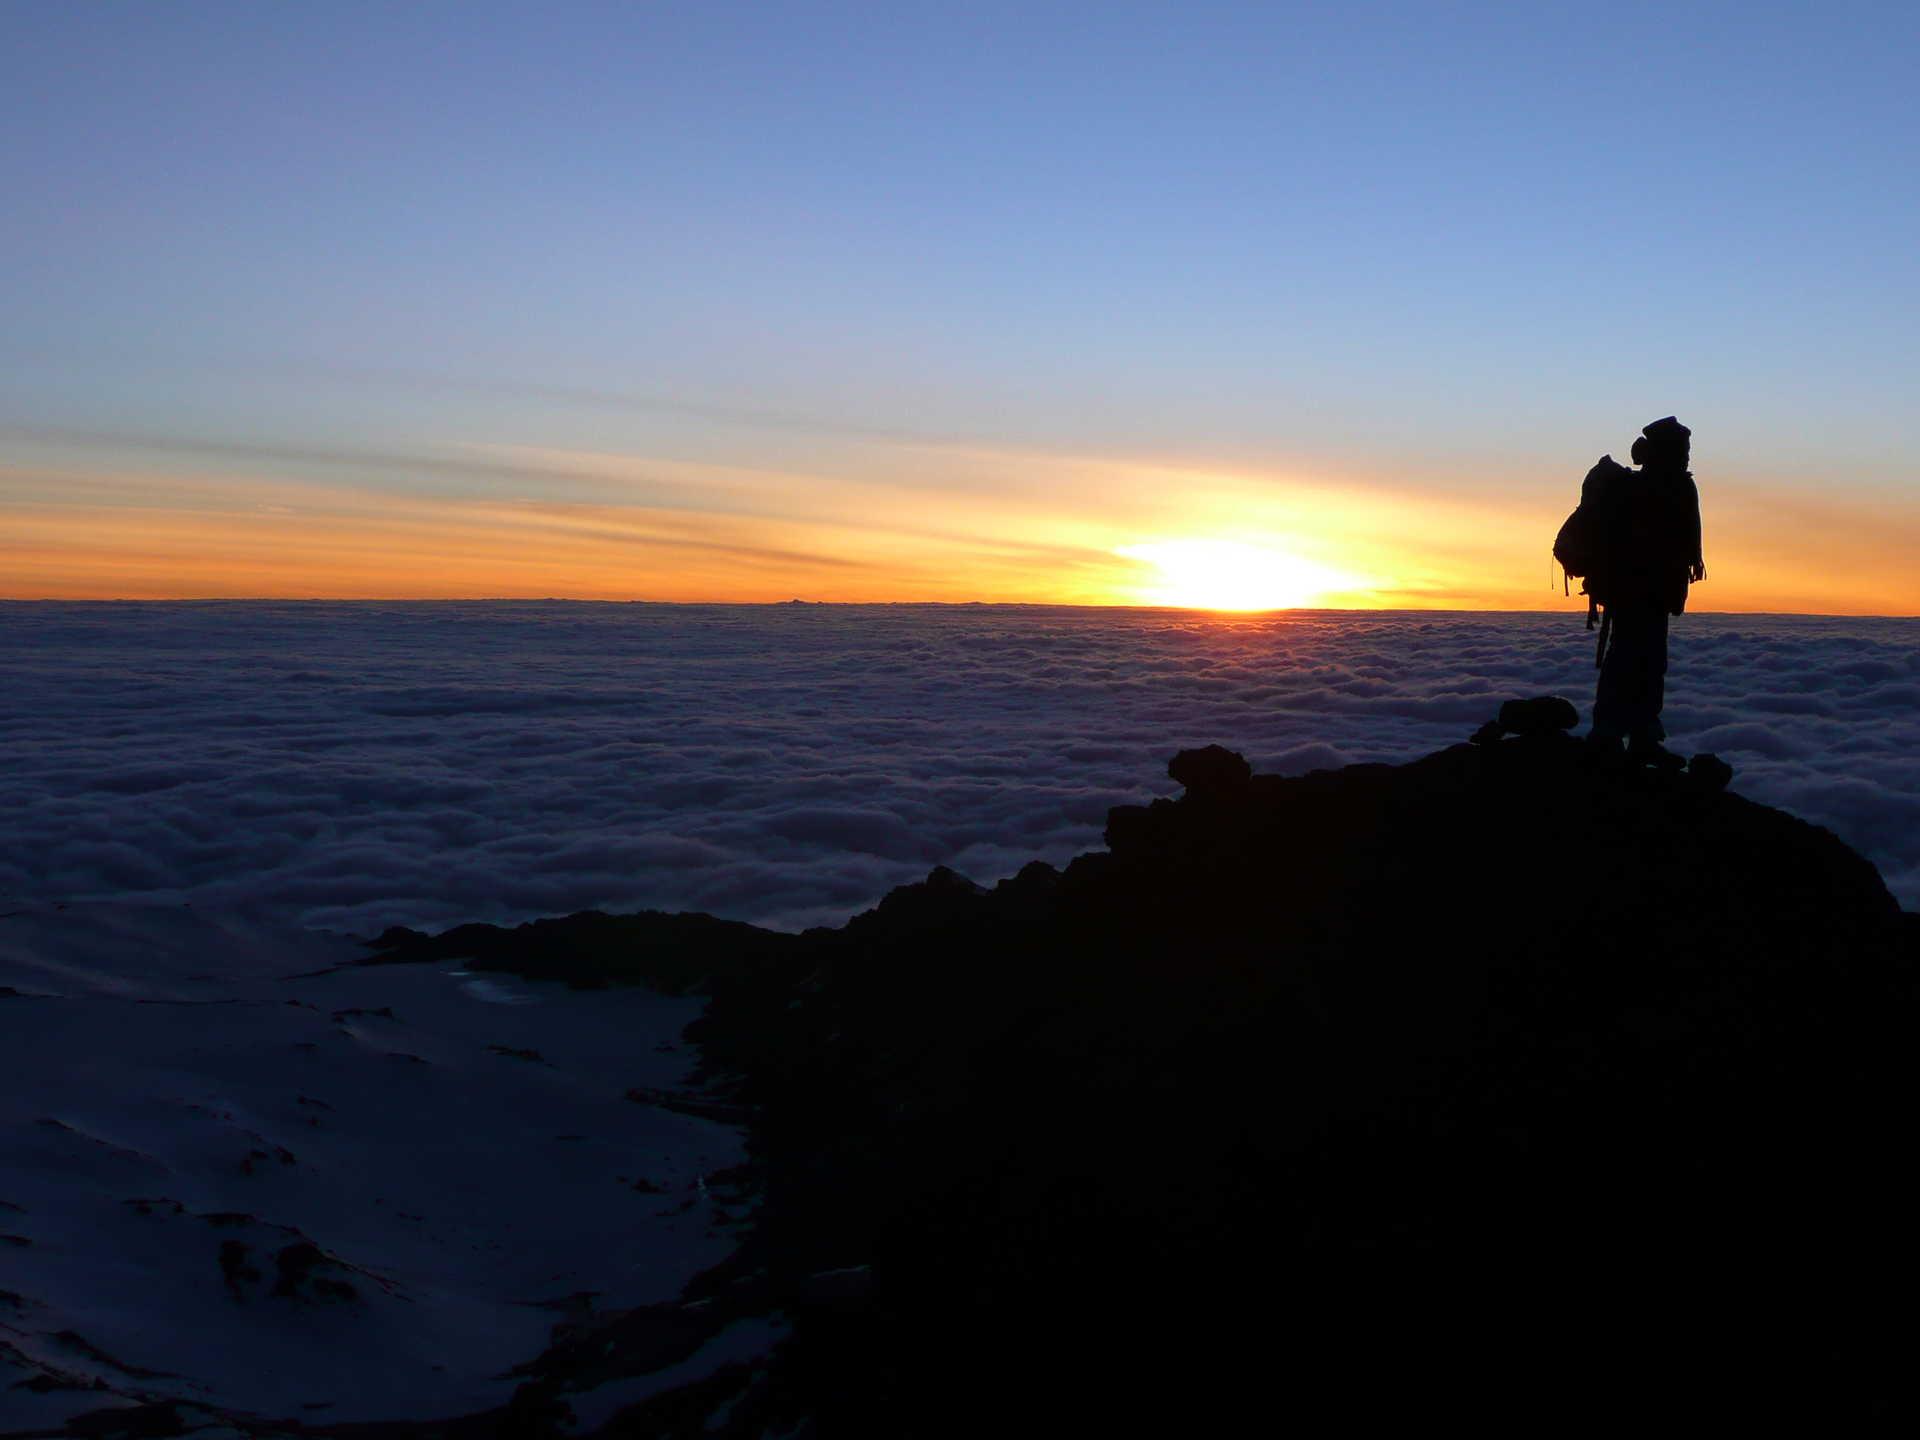 Sunrise during the Mount Kilimanjaro ascent